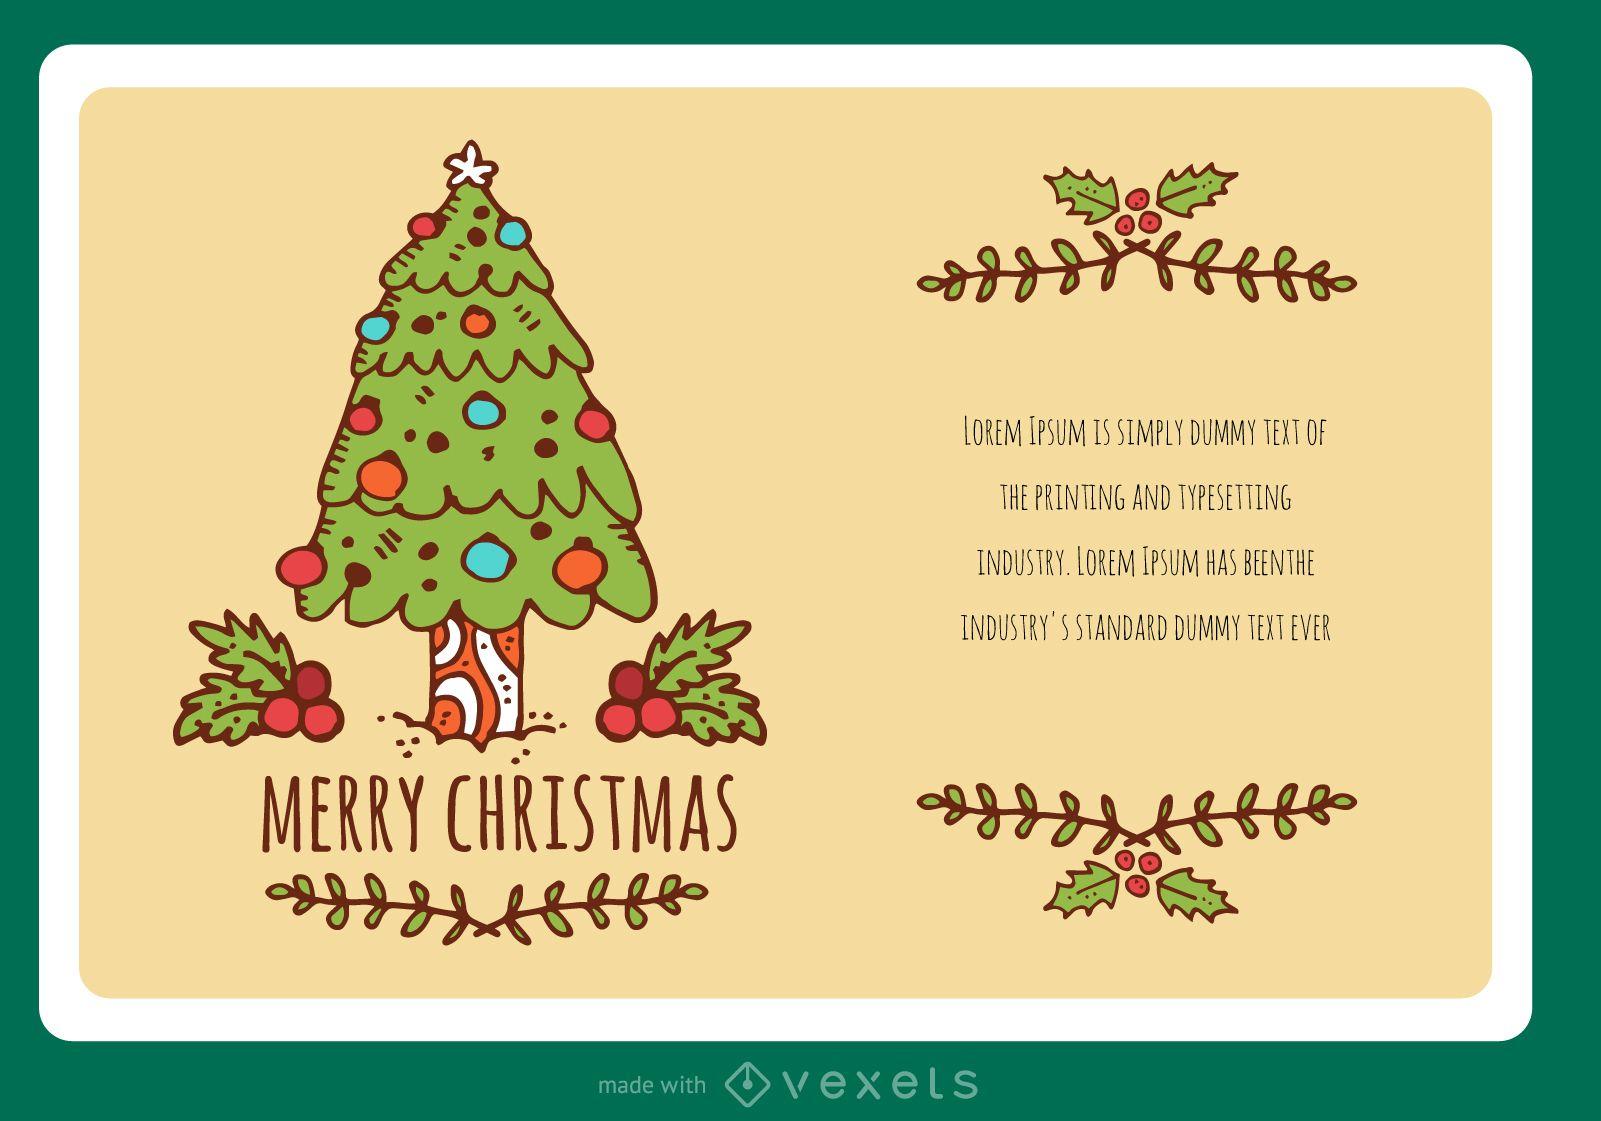 Hand-drawn stroke Christmas card creator